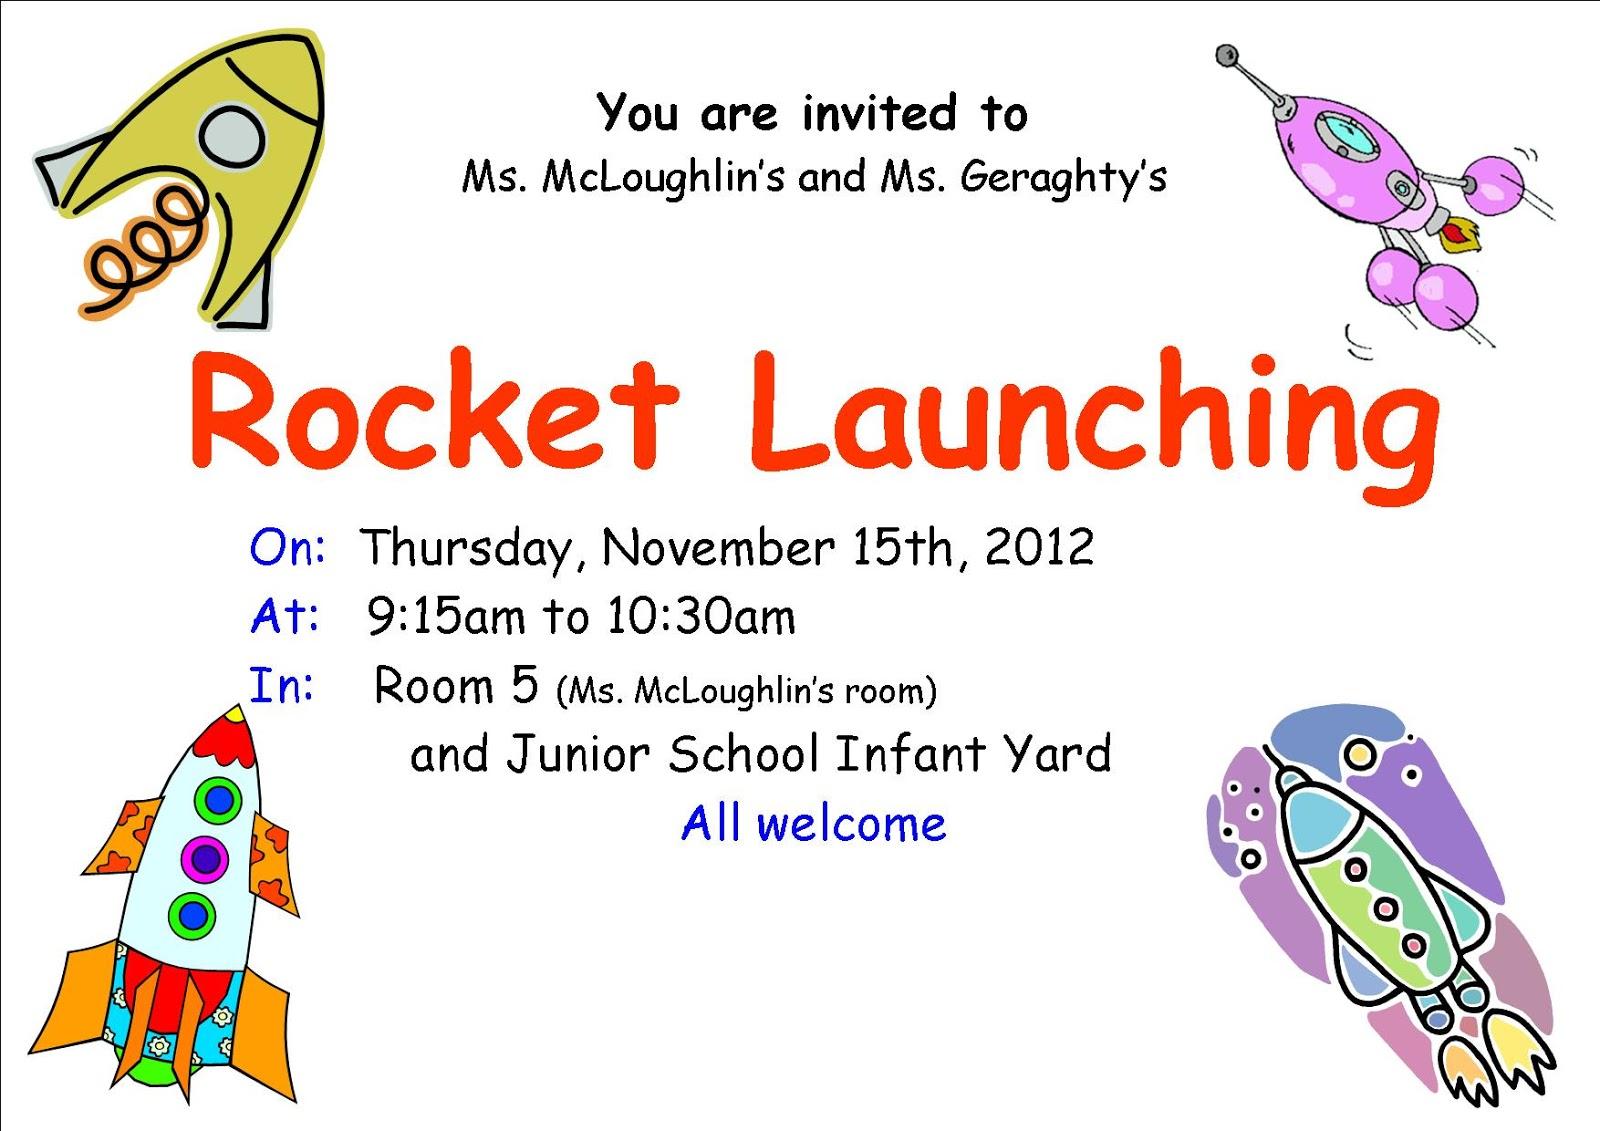 http://4.bp.blogspot.com/-KmQKKJSKdgI/UJ1dODmjP1I/AAAAAAAAktQ/OE6hXvAWeVs/s1600/Rocket+Display+invite+Big.jpg